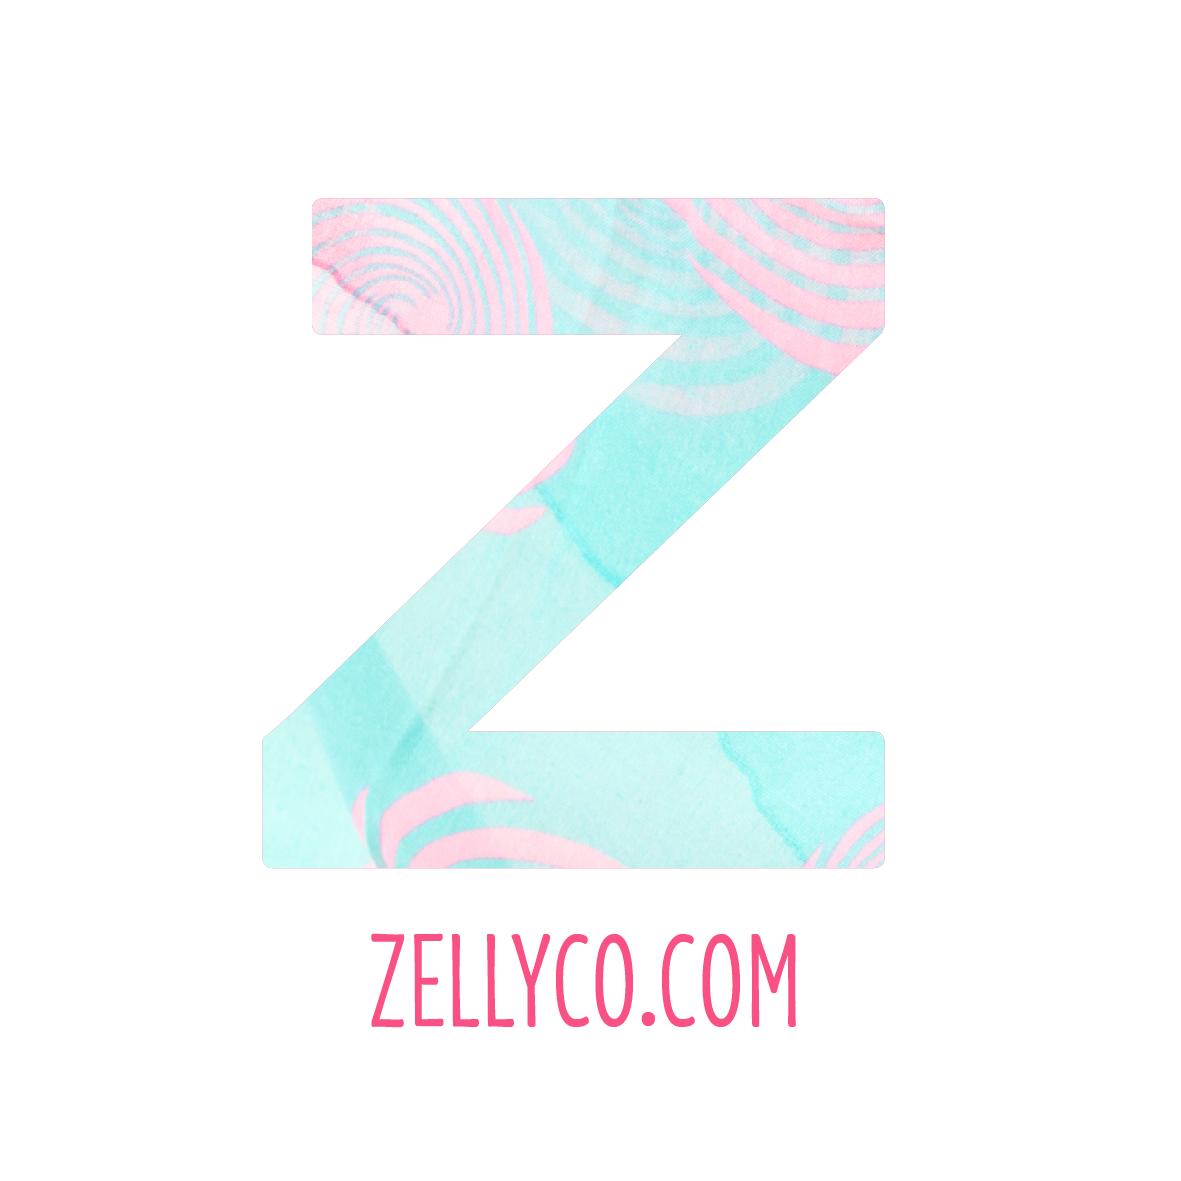 ZellyCo